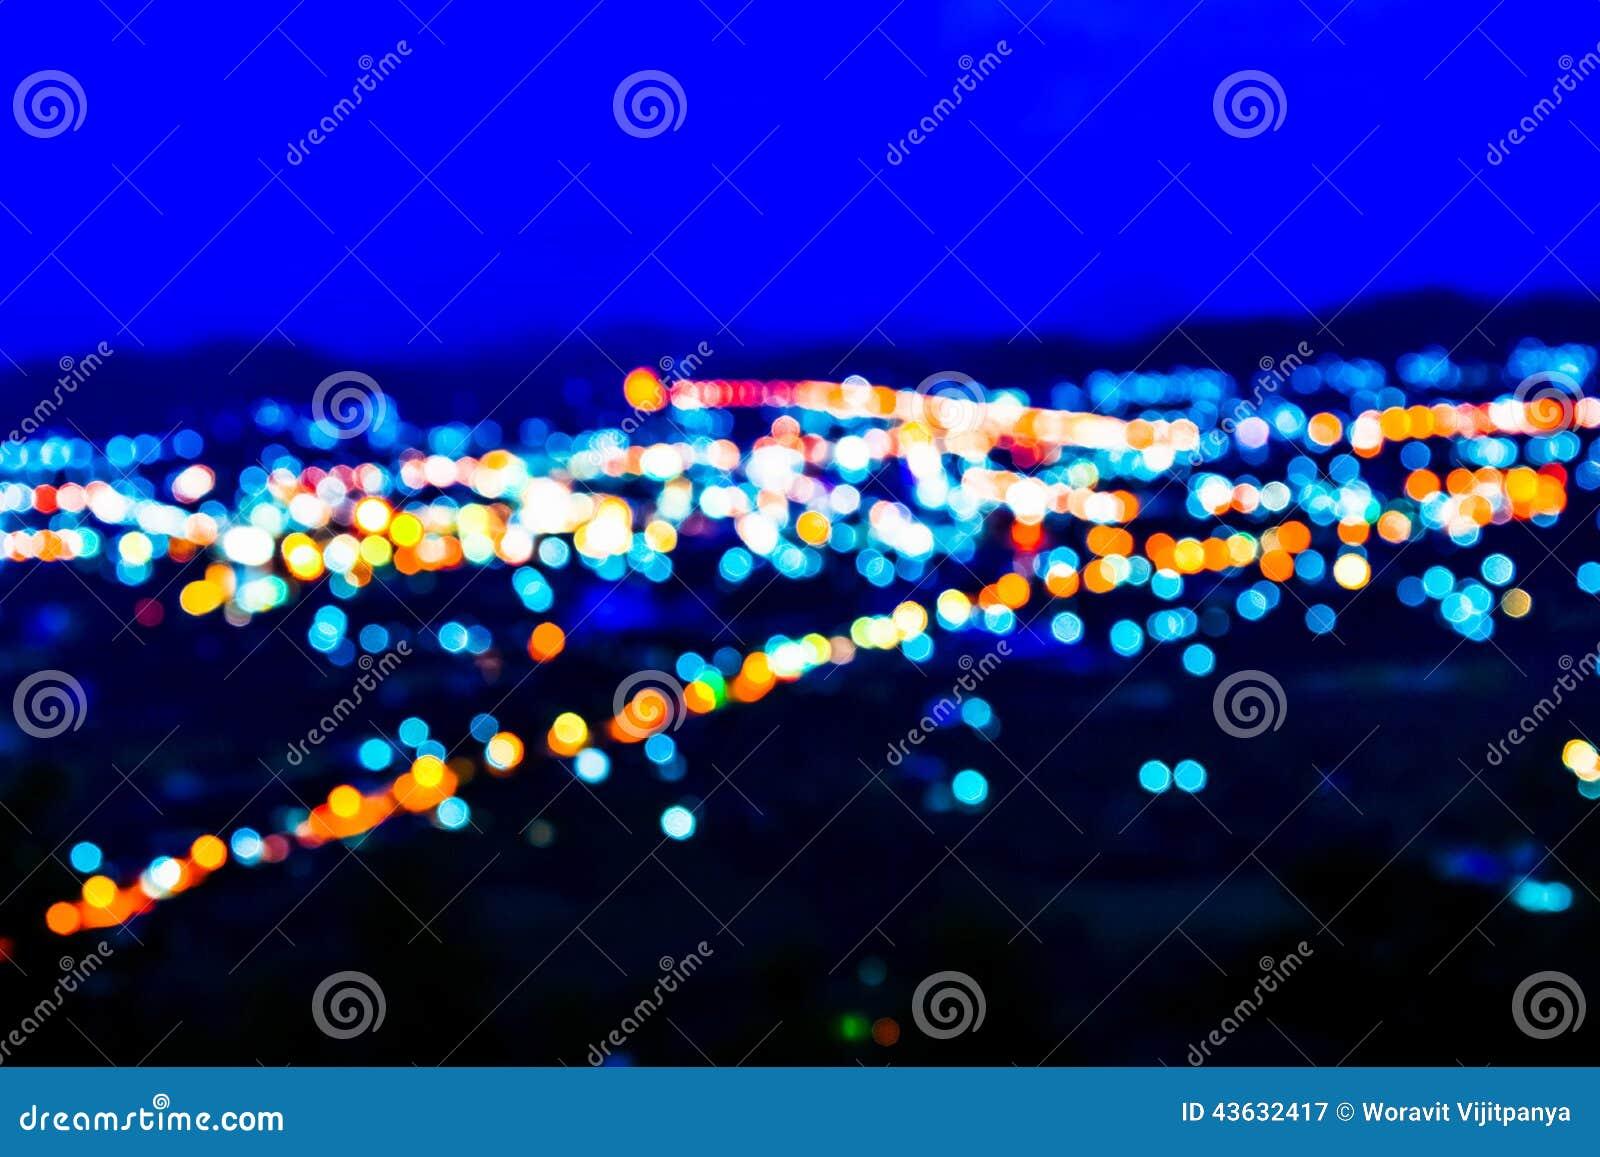 Indicatori luminosi alla notte